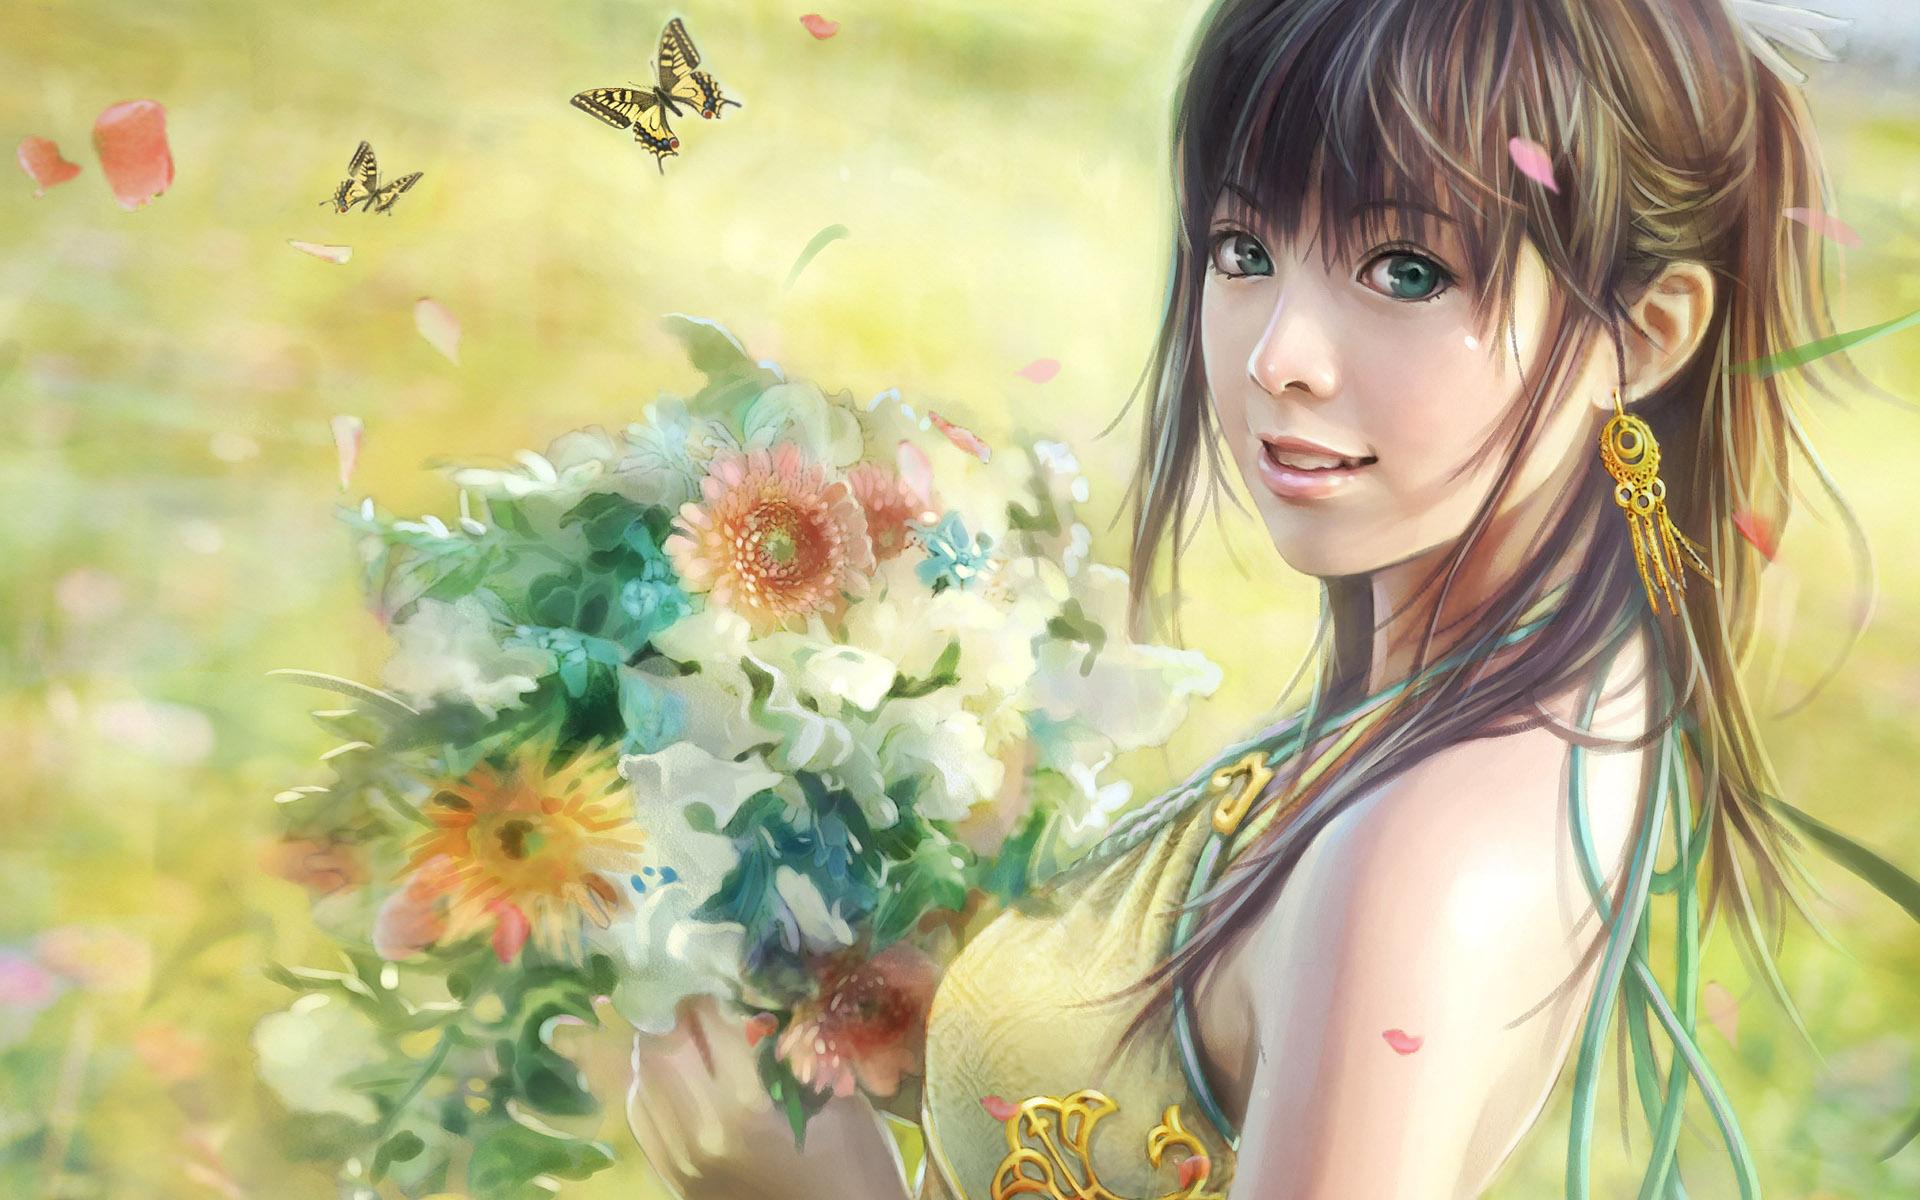 CG beautiful girl wallpaper Wallpapers   HD Wallpapers 81317 1920x1200